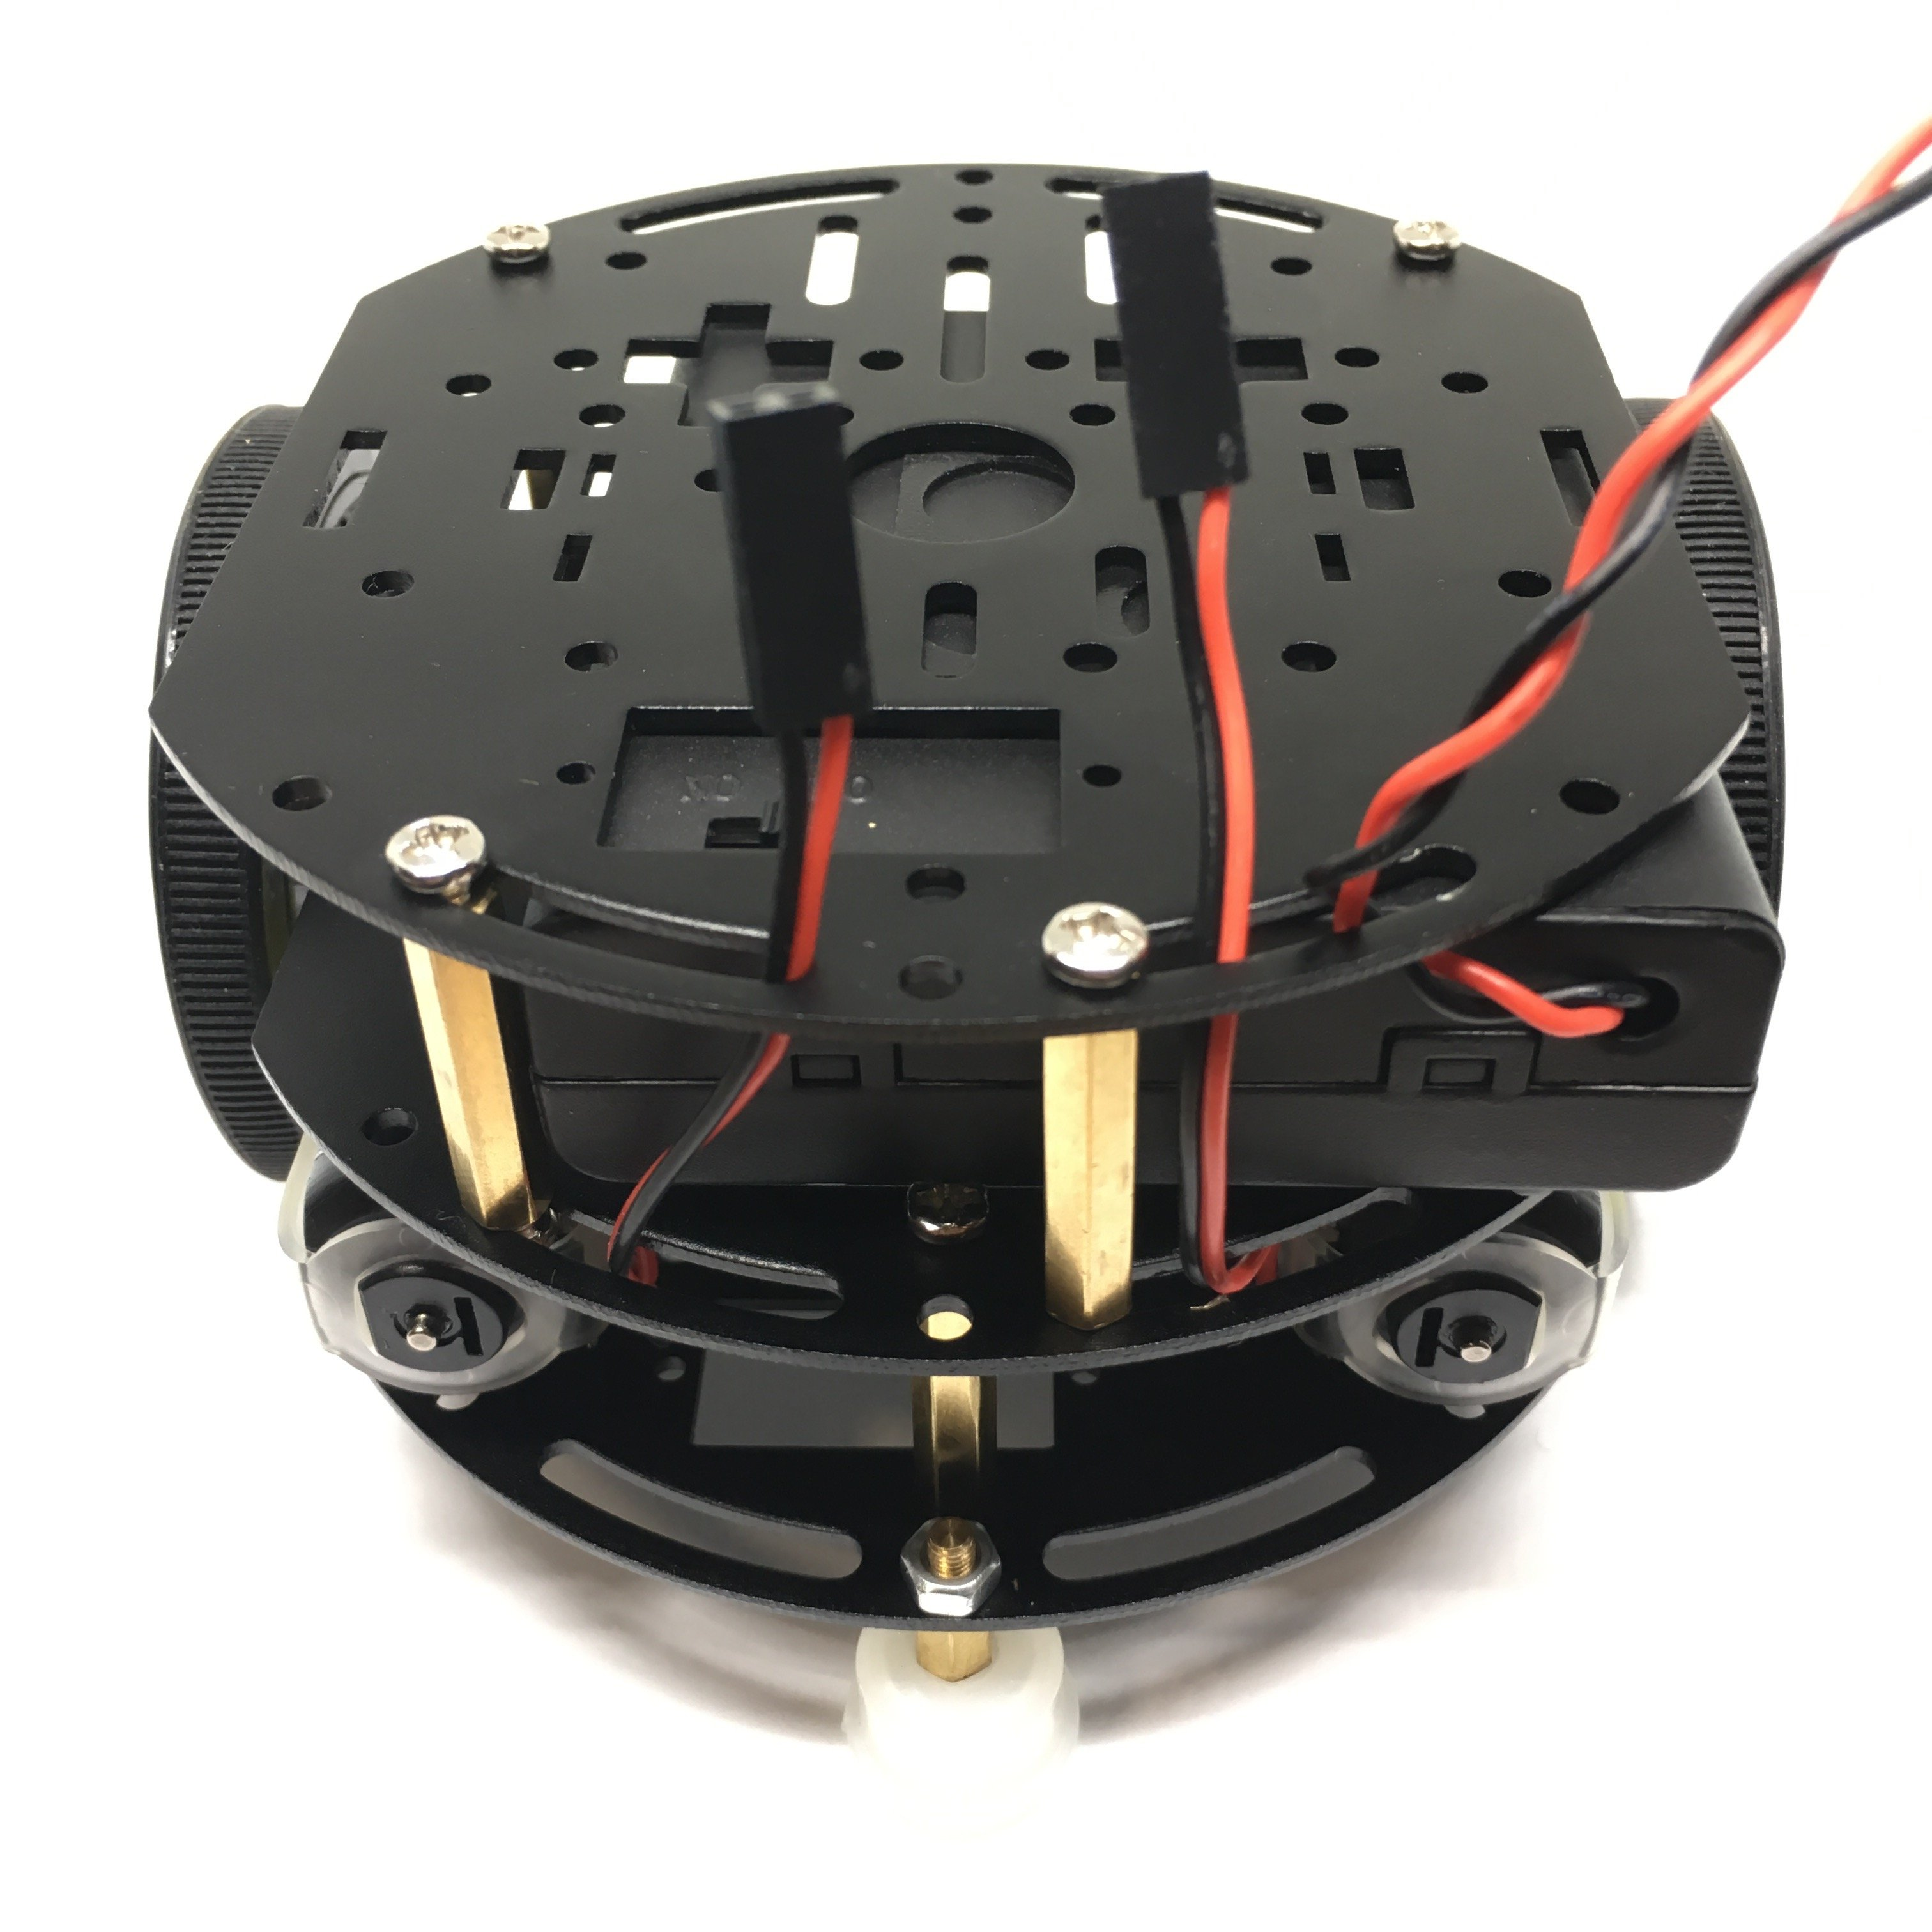 learn_arduino_robotics_IMG_0901.jpg